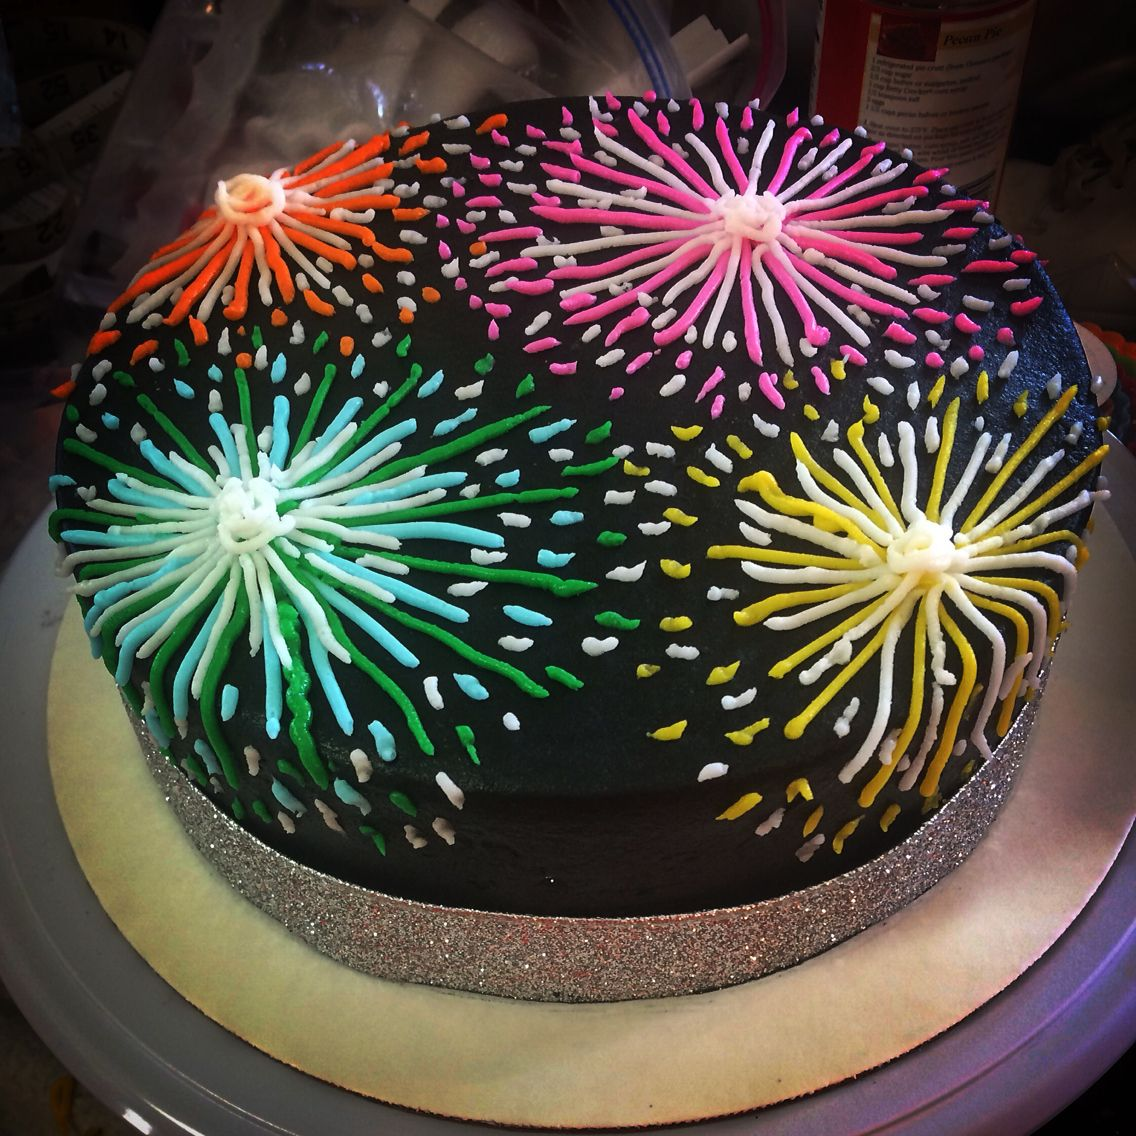 Superb Fireworks Cake Fireworks Cake Cake Decorating Cake Funny Birthday Cards Online Bapapcheapnameinfo